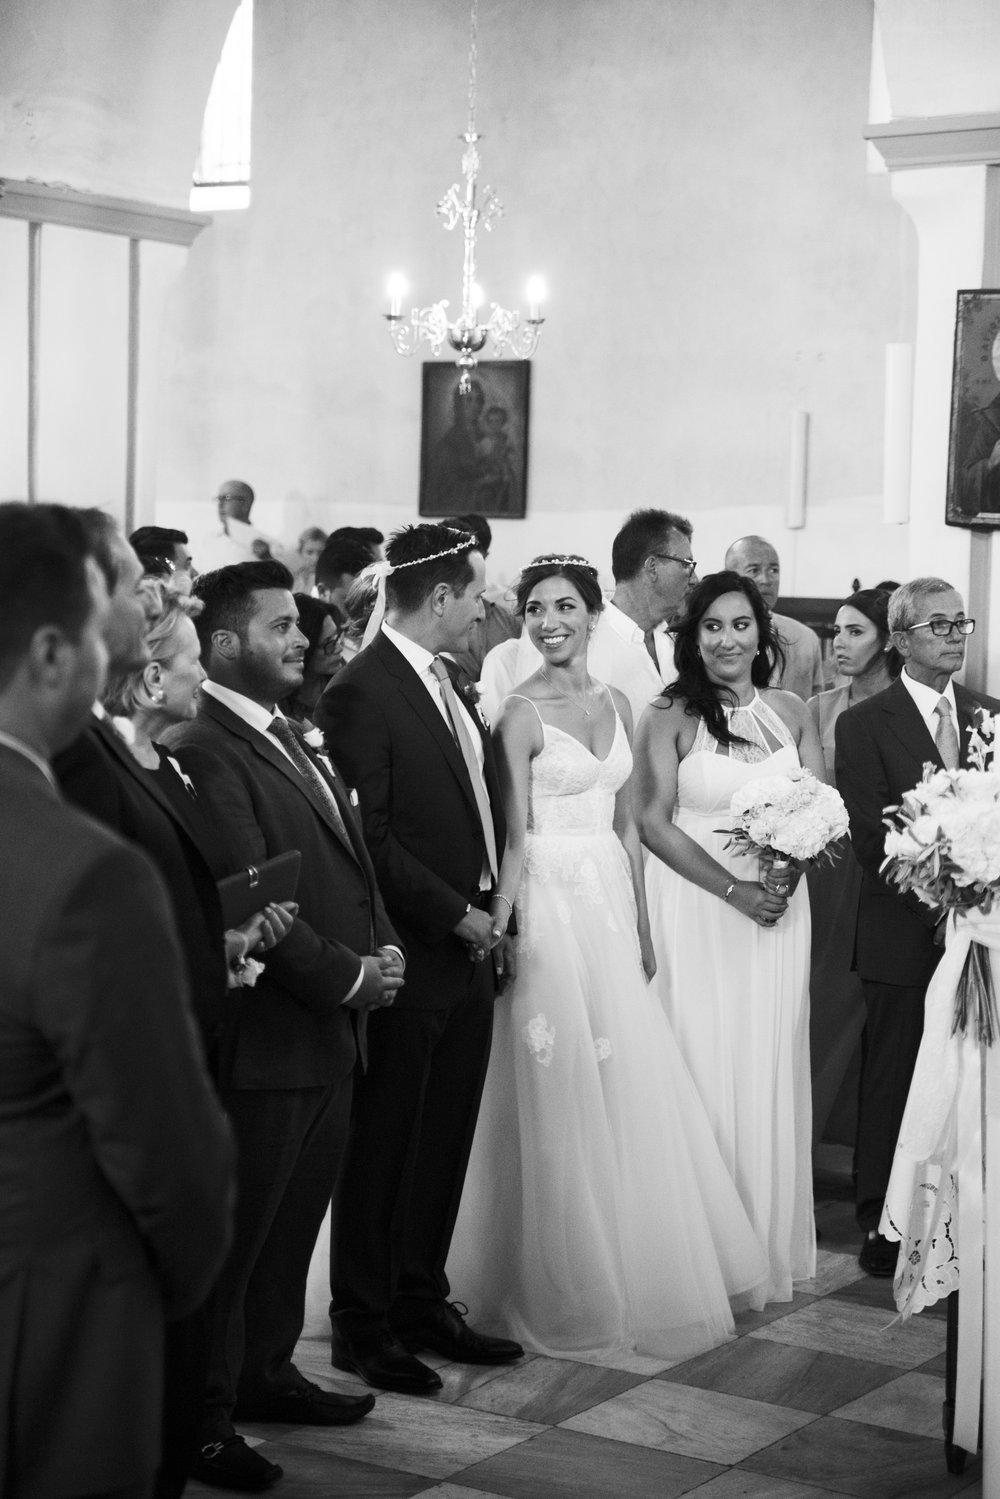 RosewoodWeddingPhotos-DestinationWeddingPhotographer-Greece-Monemvasia-DestinationWedding-WeddingsinGreece-GreekWedding-GreekOrthodoxWedding-WeddingCeremony